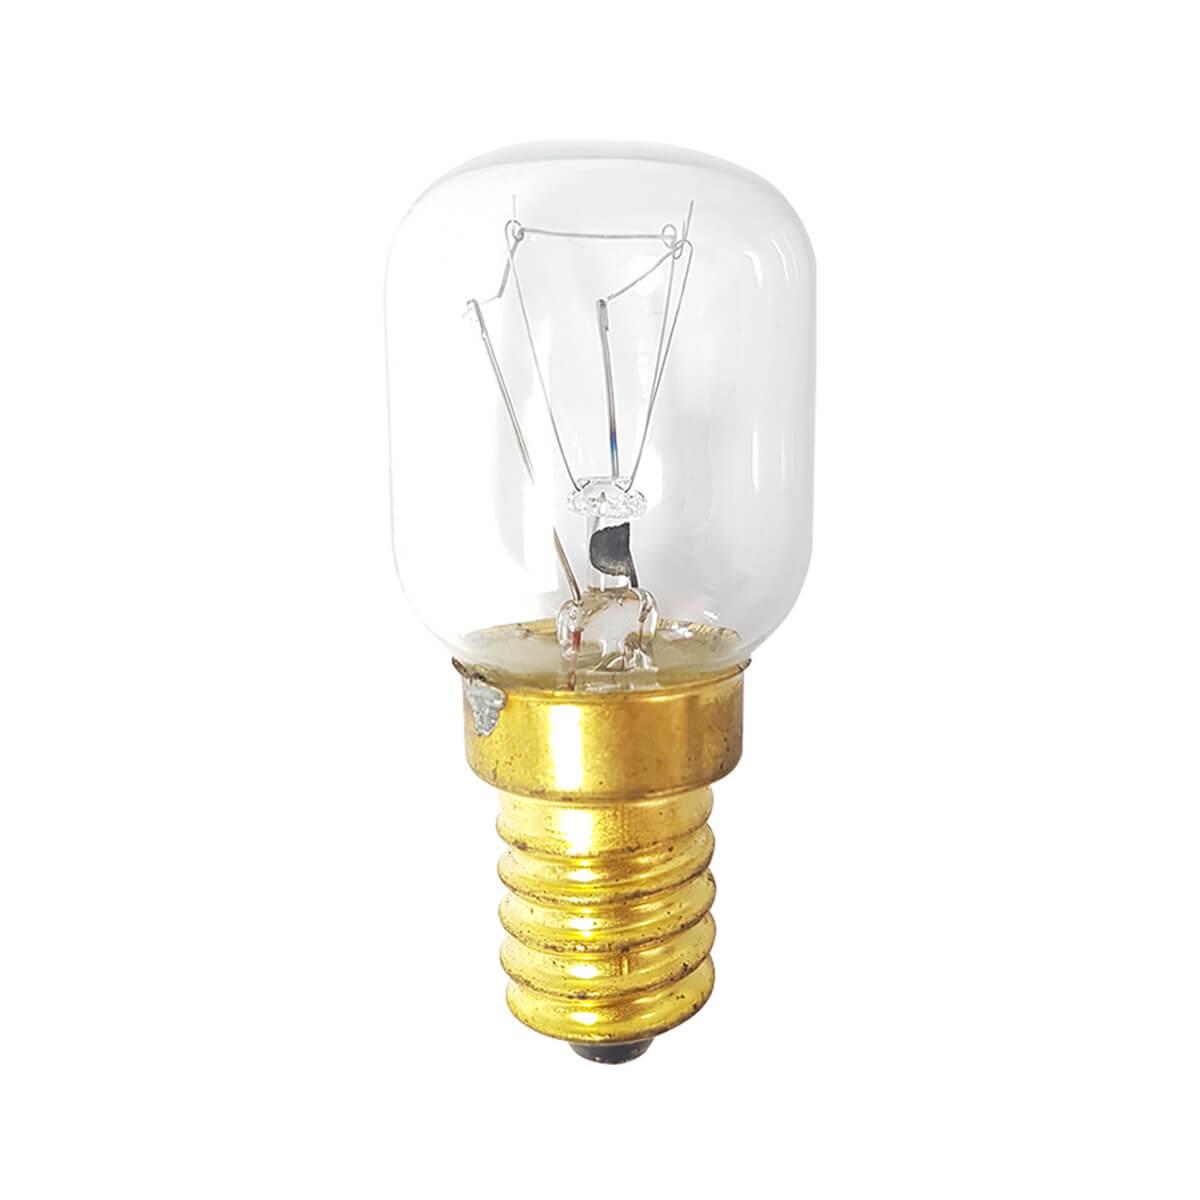 Lâmpada 25W 220V Para Forno Elétrico Electrolux FB54X FB54B FX54T FB54T - 256079000005